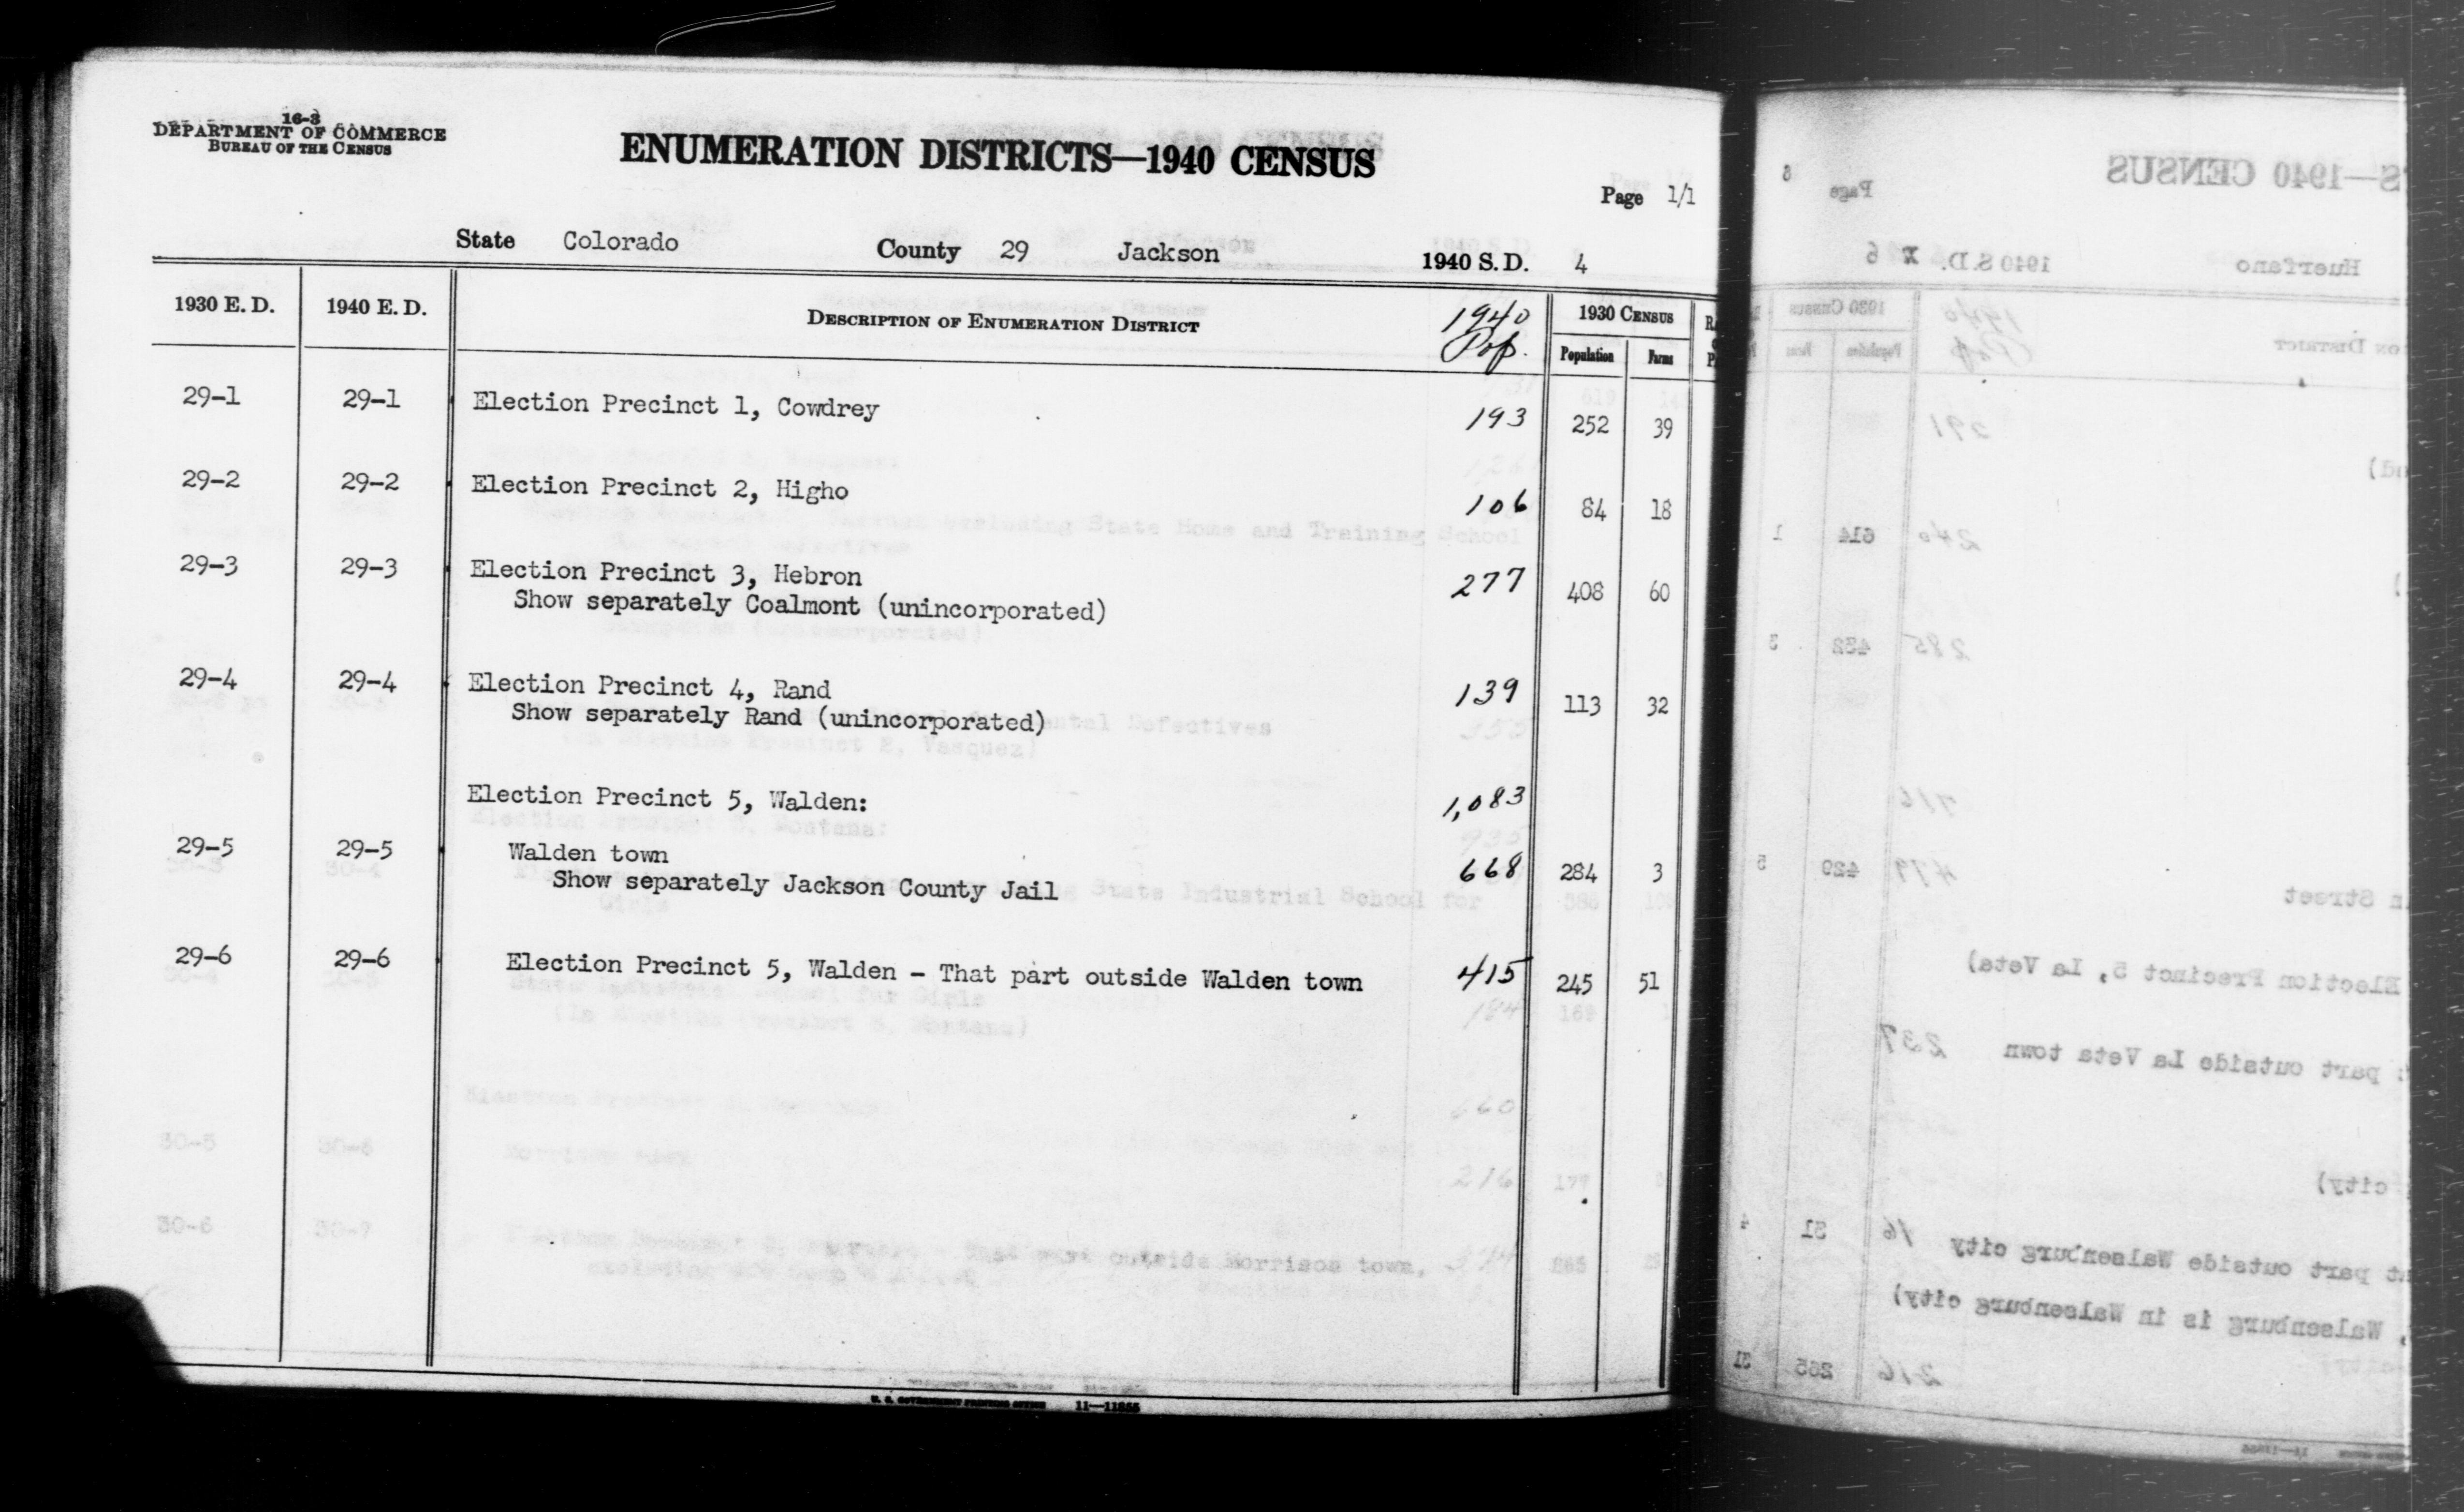 1940 Census Enumeration District Descriptions - Colorado - Jackson County - ED 29-1, ED 29-2, ED 29-3, ED 29-4, ED 29-5, ED 29-6